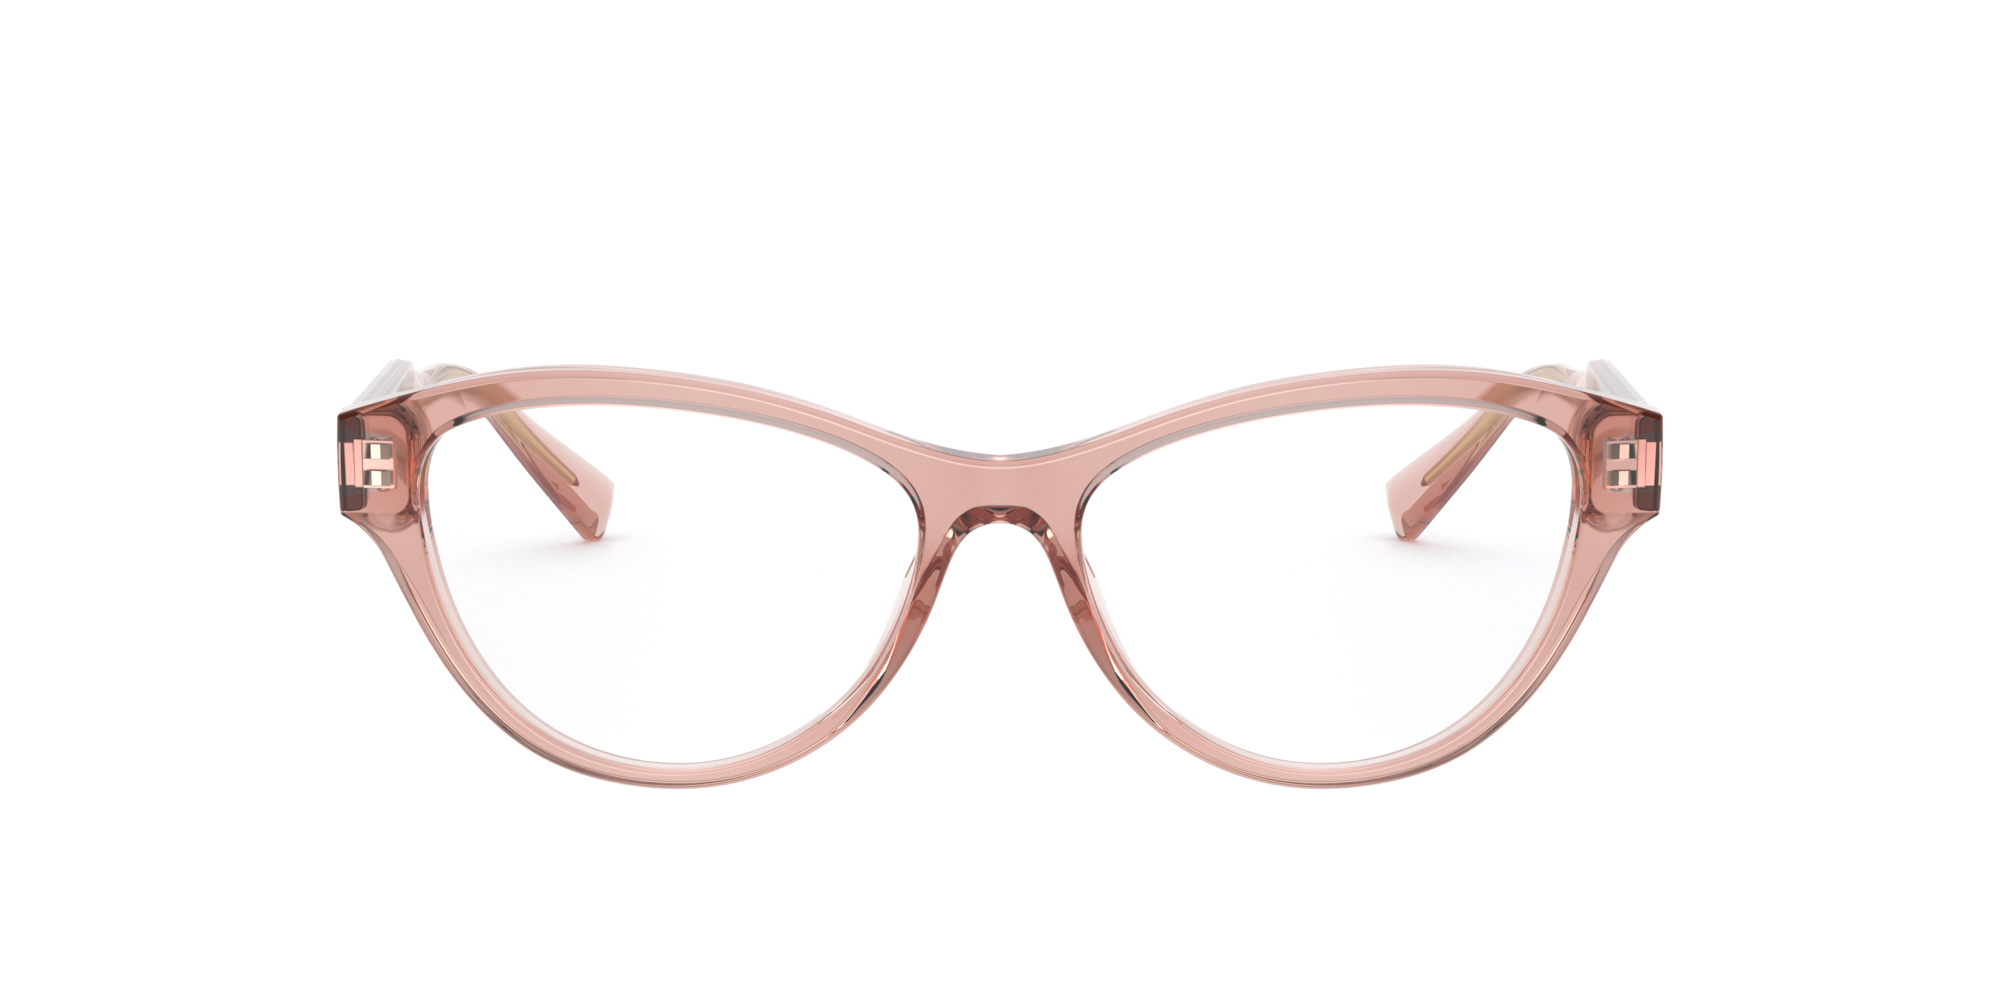 Image for VE3276 from LensCrafters | Glasses, Prescription Glasses Online, Eyewear